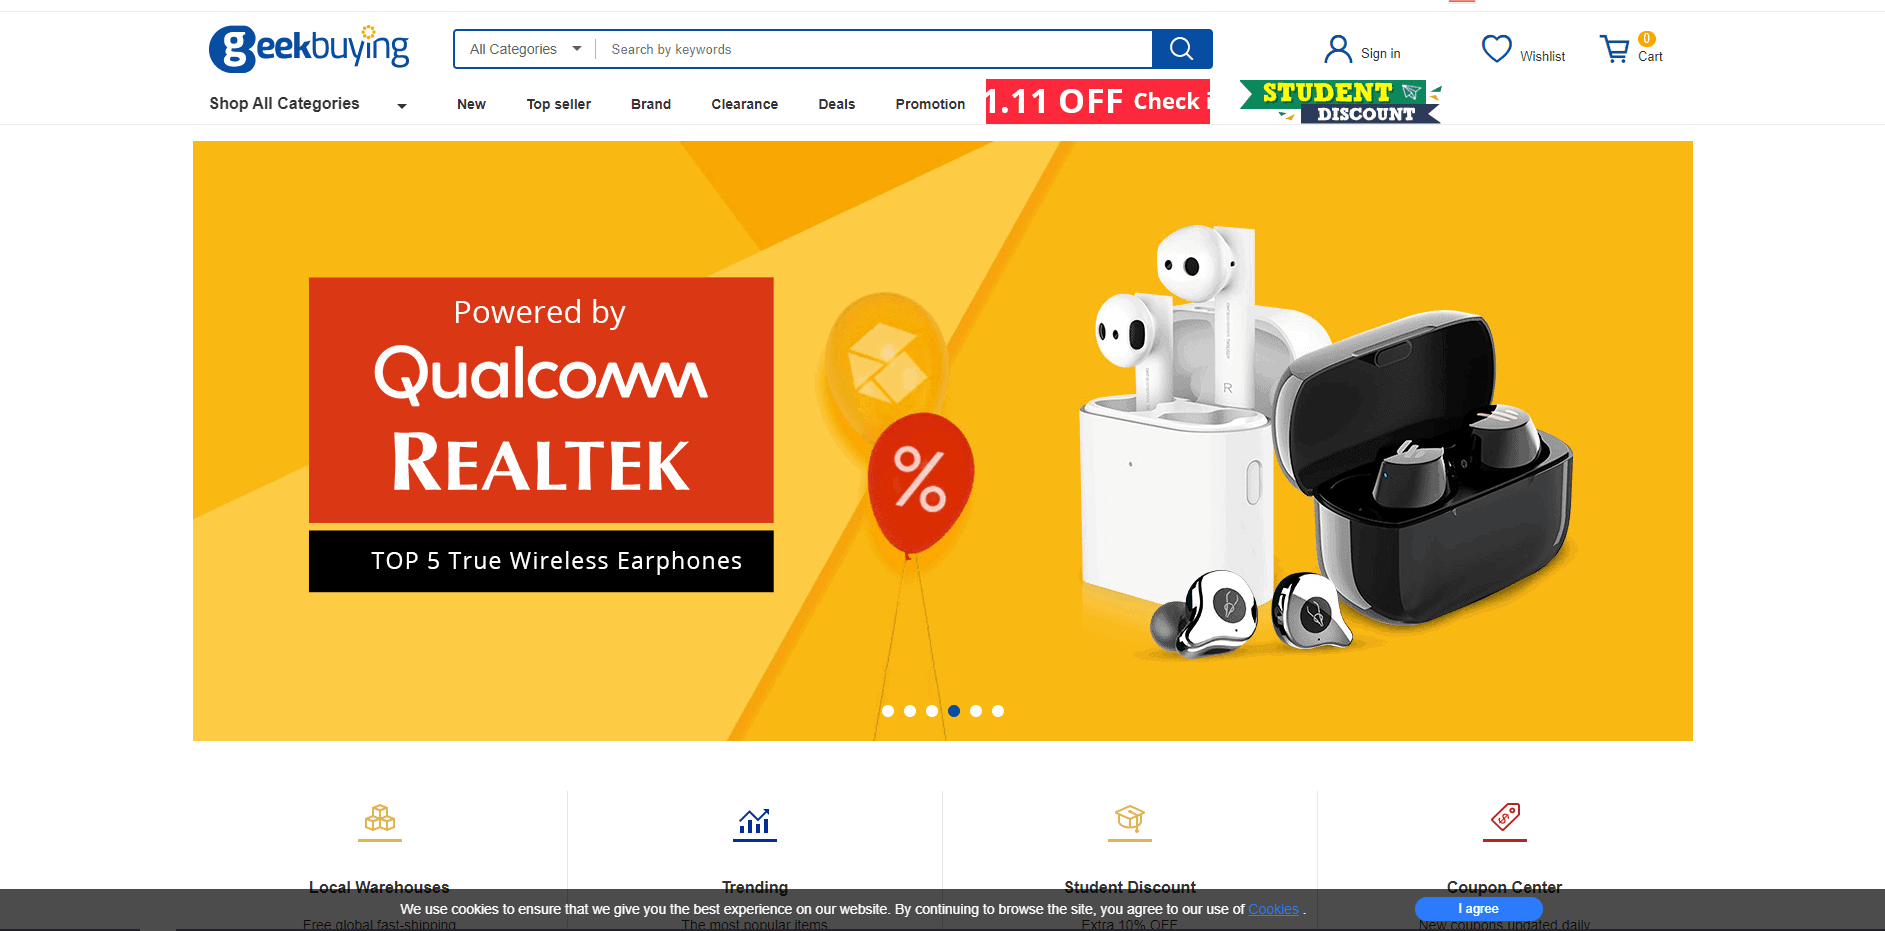 geekbuying.com review